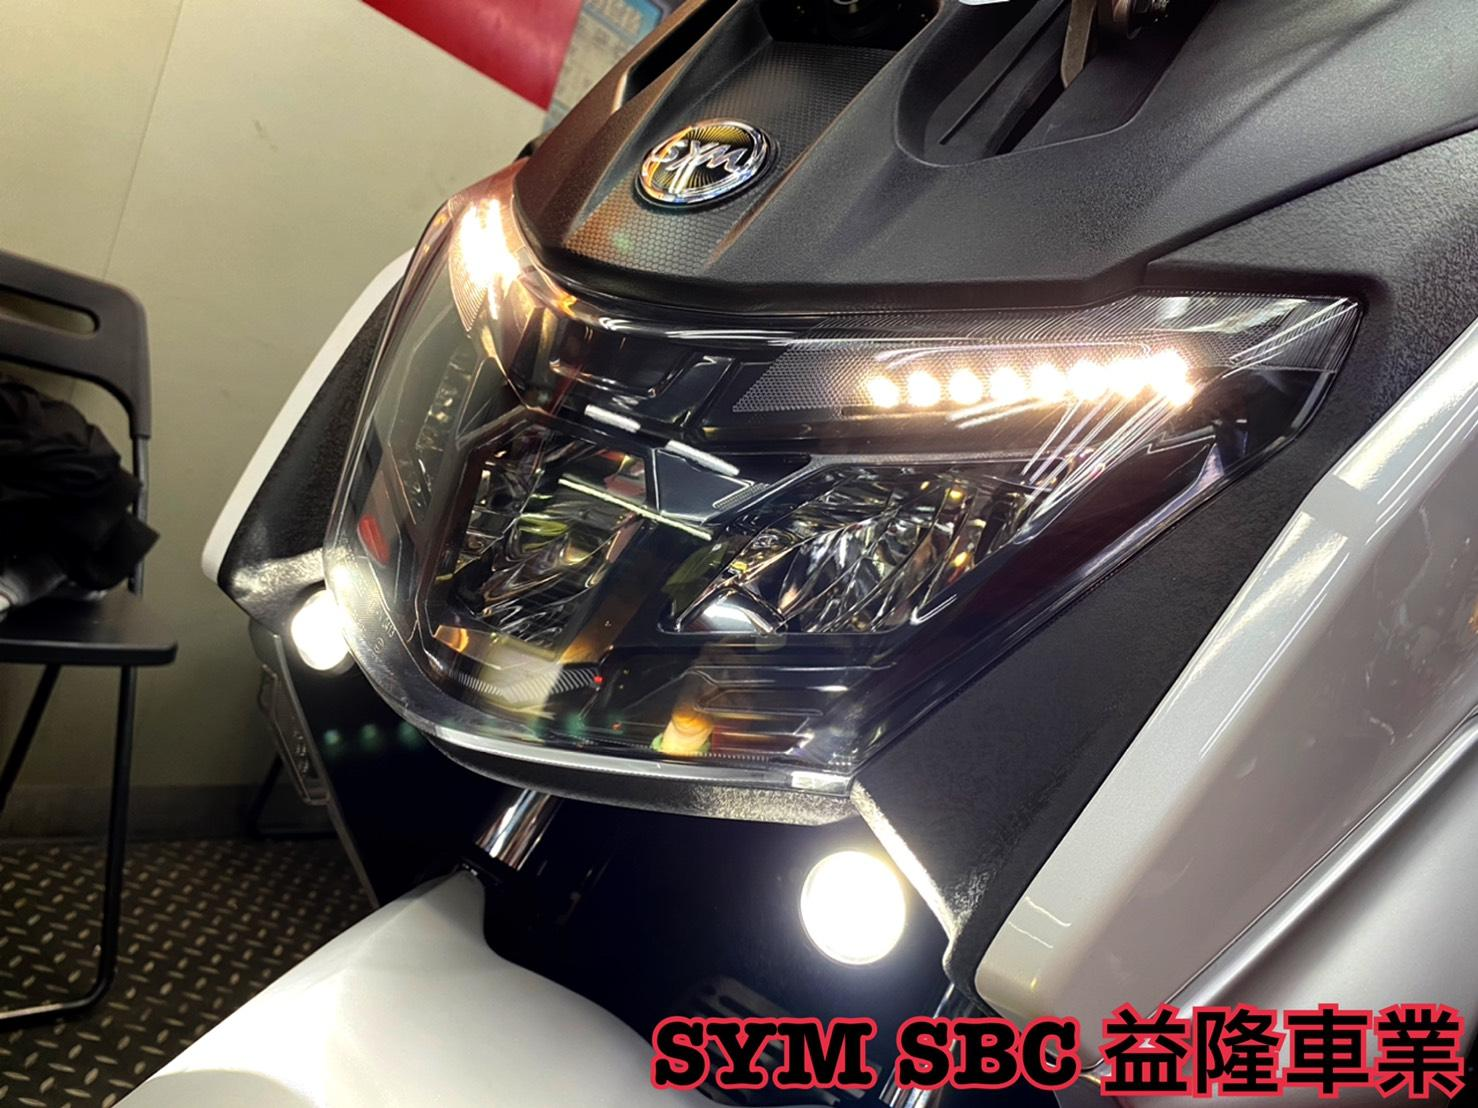 MAXSYM TL 500 安裝 龍珠霧燈組*SYM SBC 益隆車業*